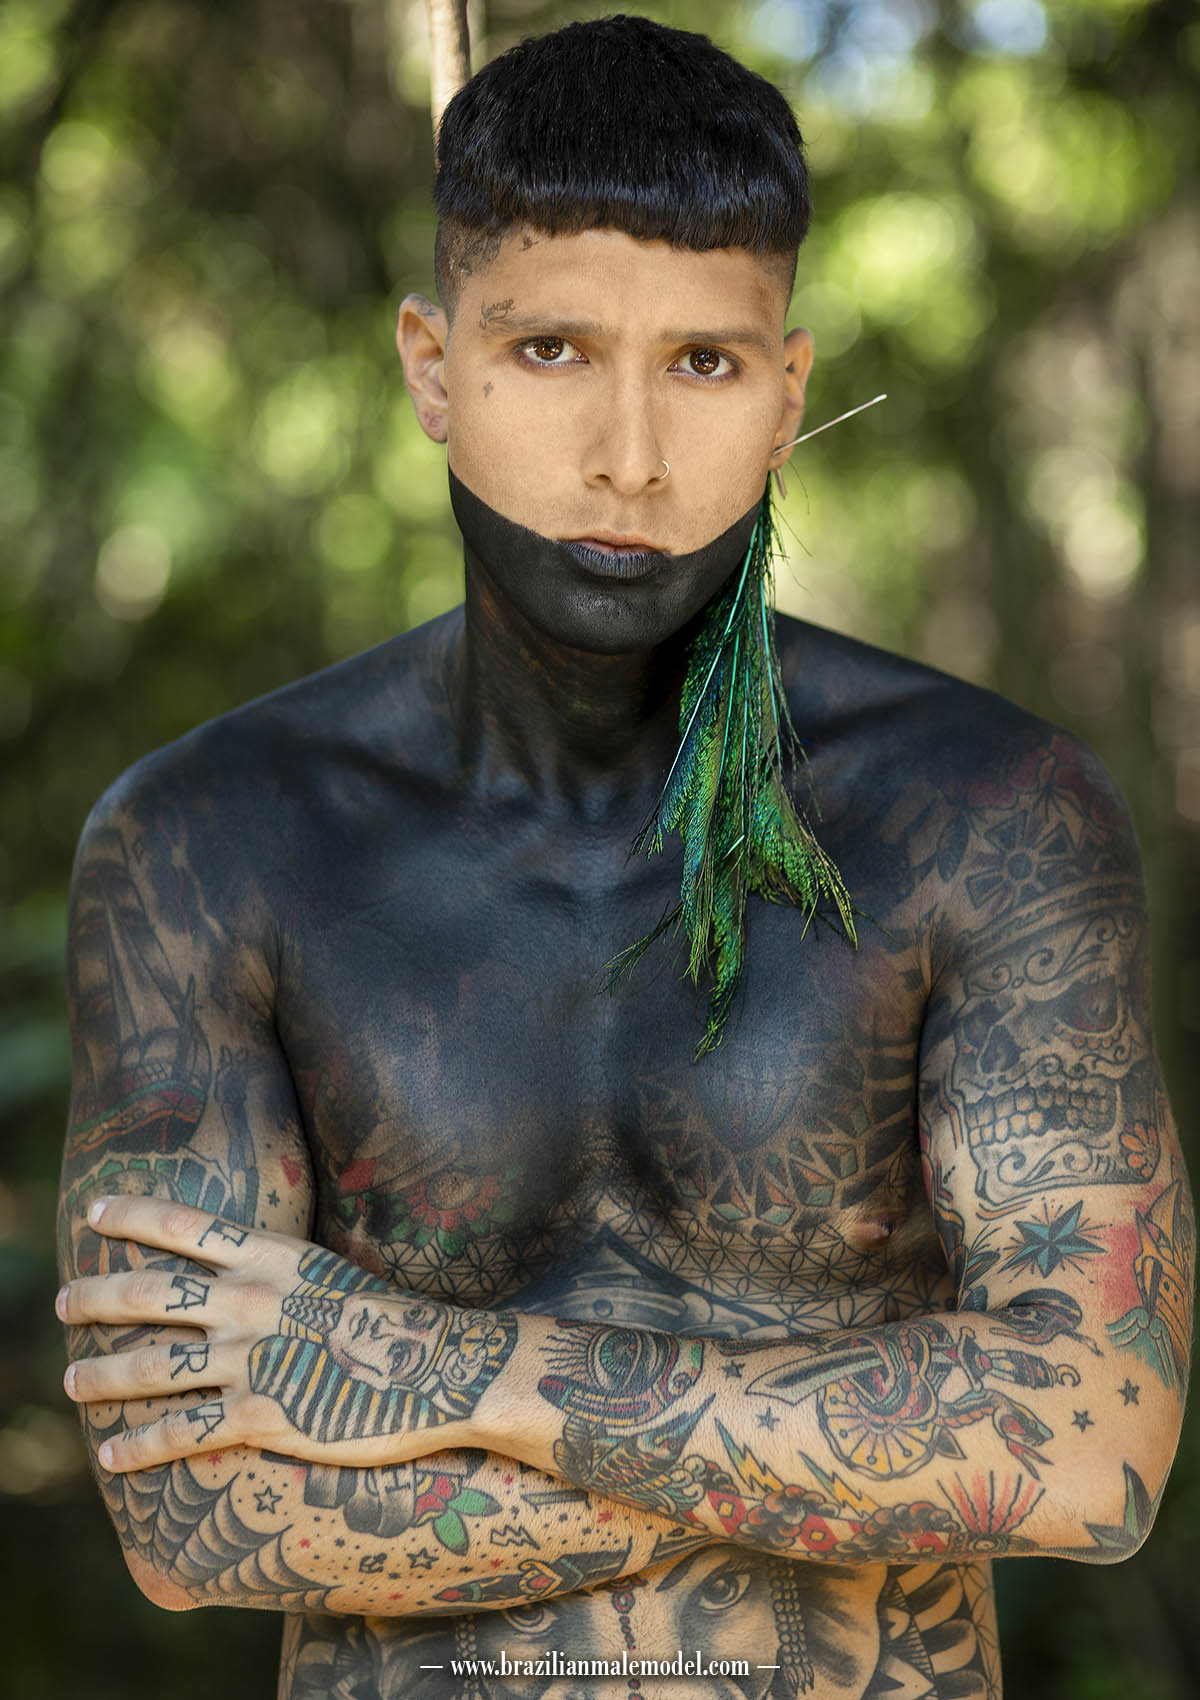 Thiago Perri fotografado por Marcio Farias na floresta amazônica